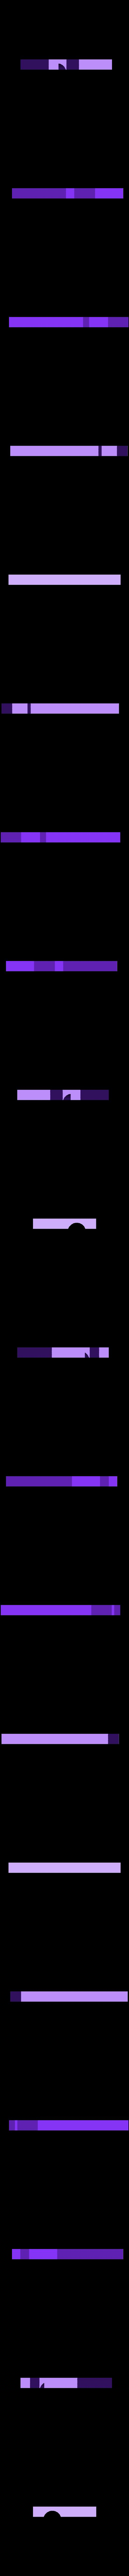 Clasp_2.stl Download free STL file Jacket Buckle-Clasp • 3D printable design, rabotilnicata